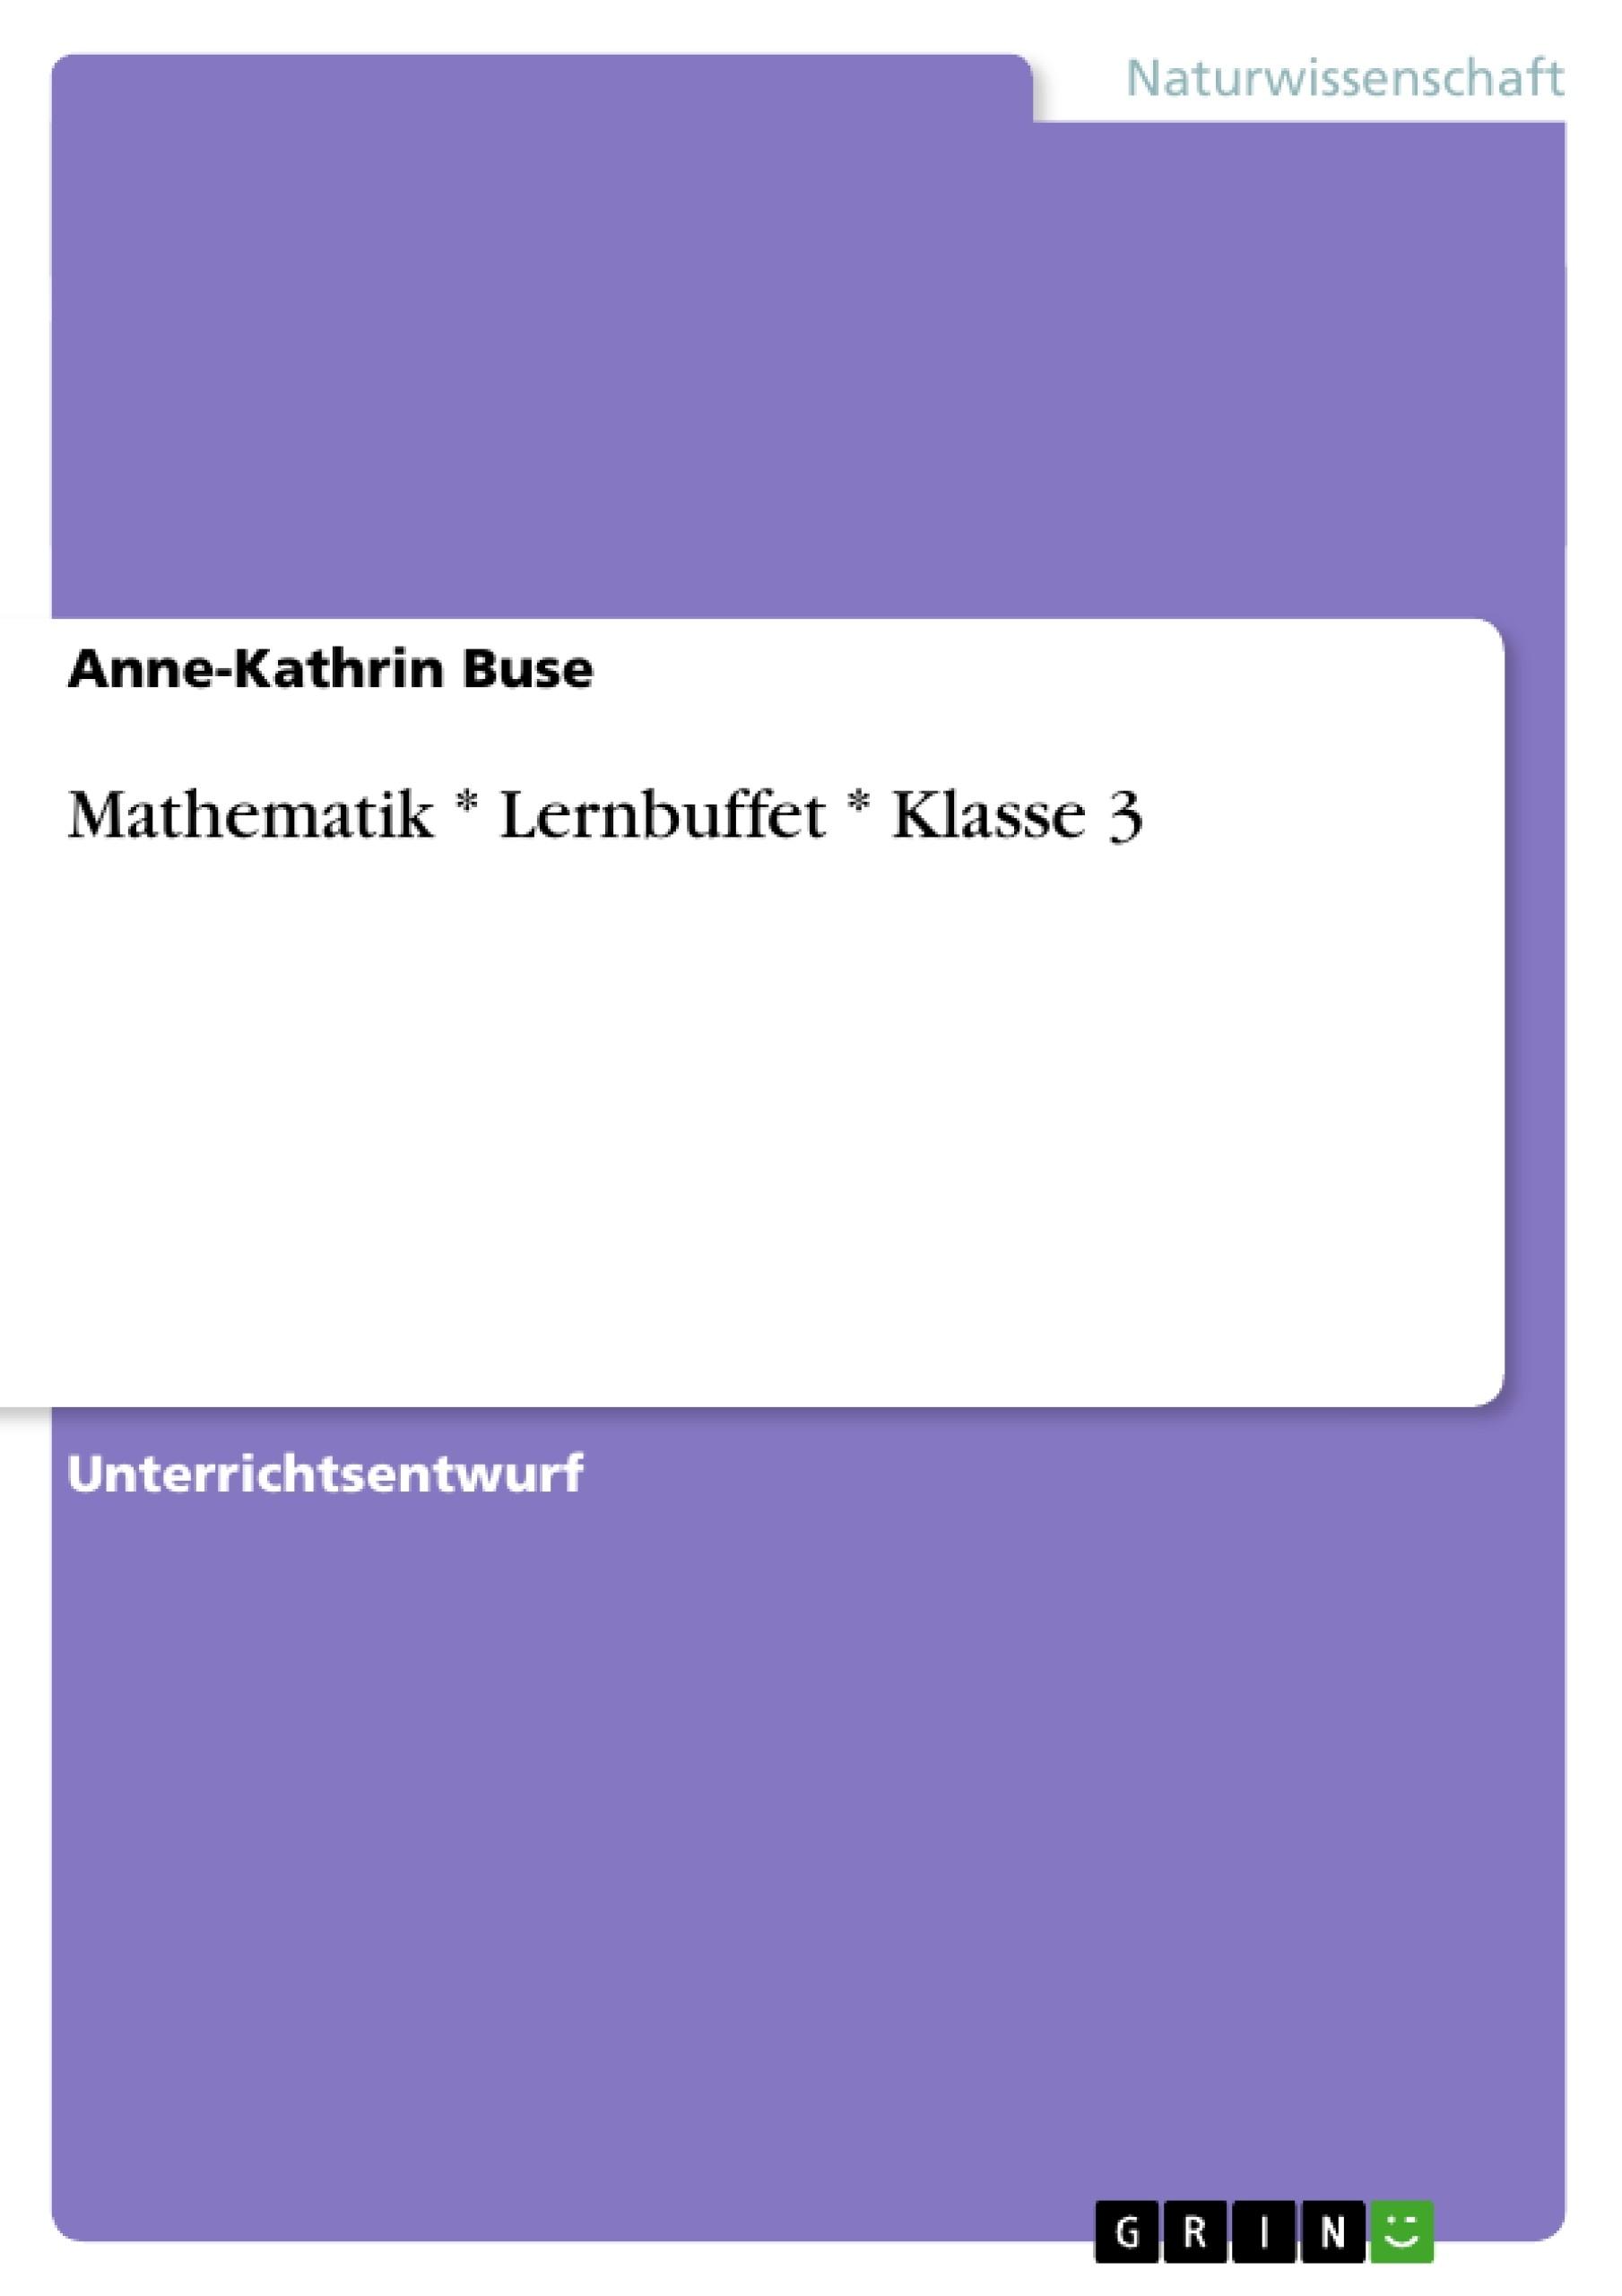 Titel: Mathematik * Lernbuffet * Klasse 3